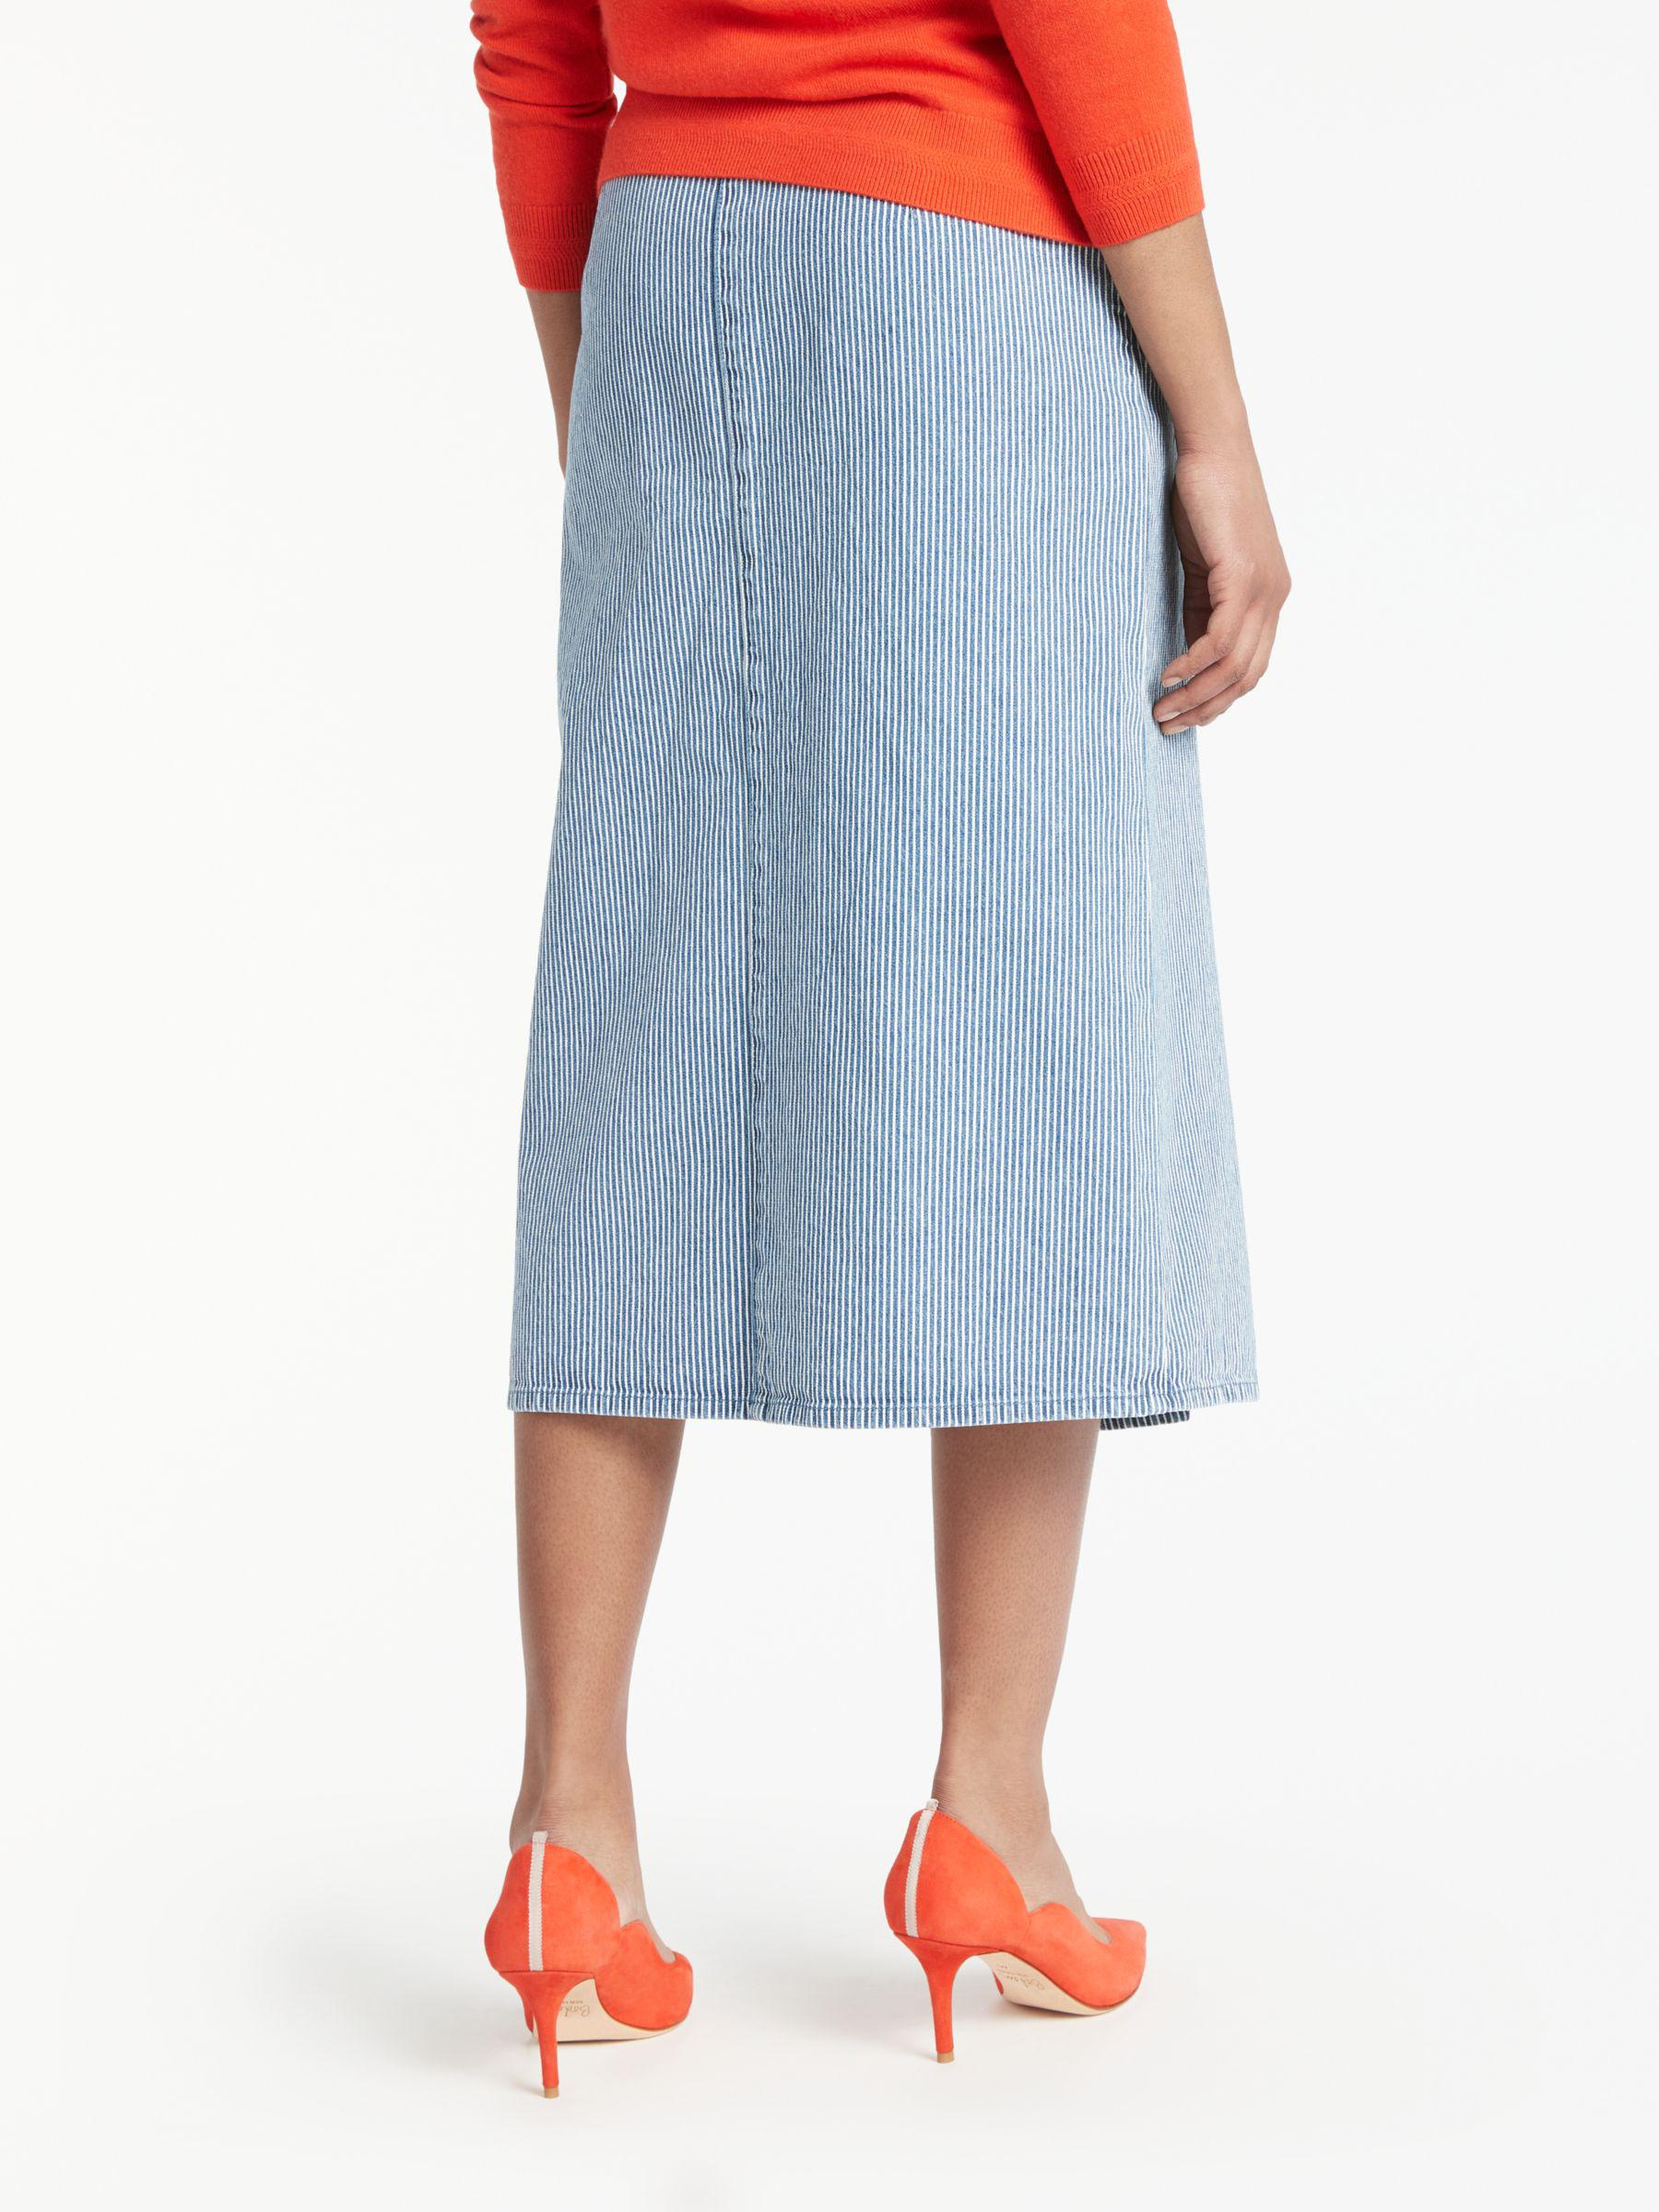 5d5f2675bf Boden Mira Denim Skirt in Blue - Lyst